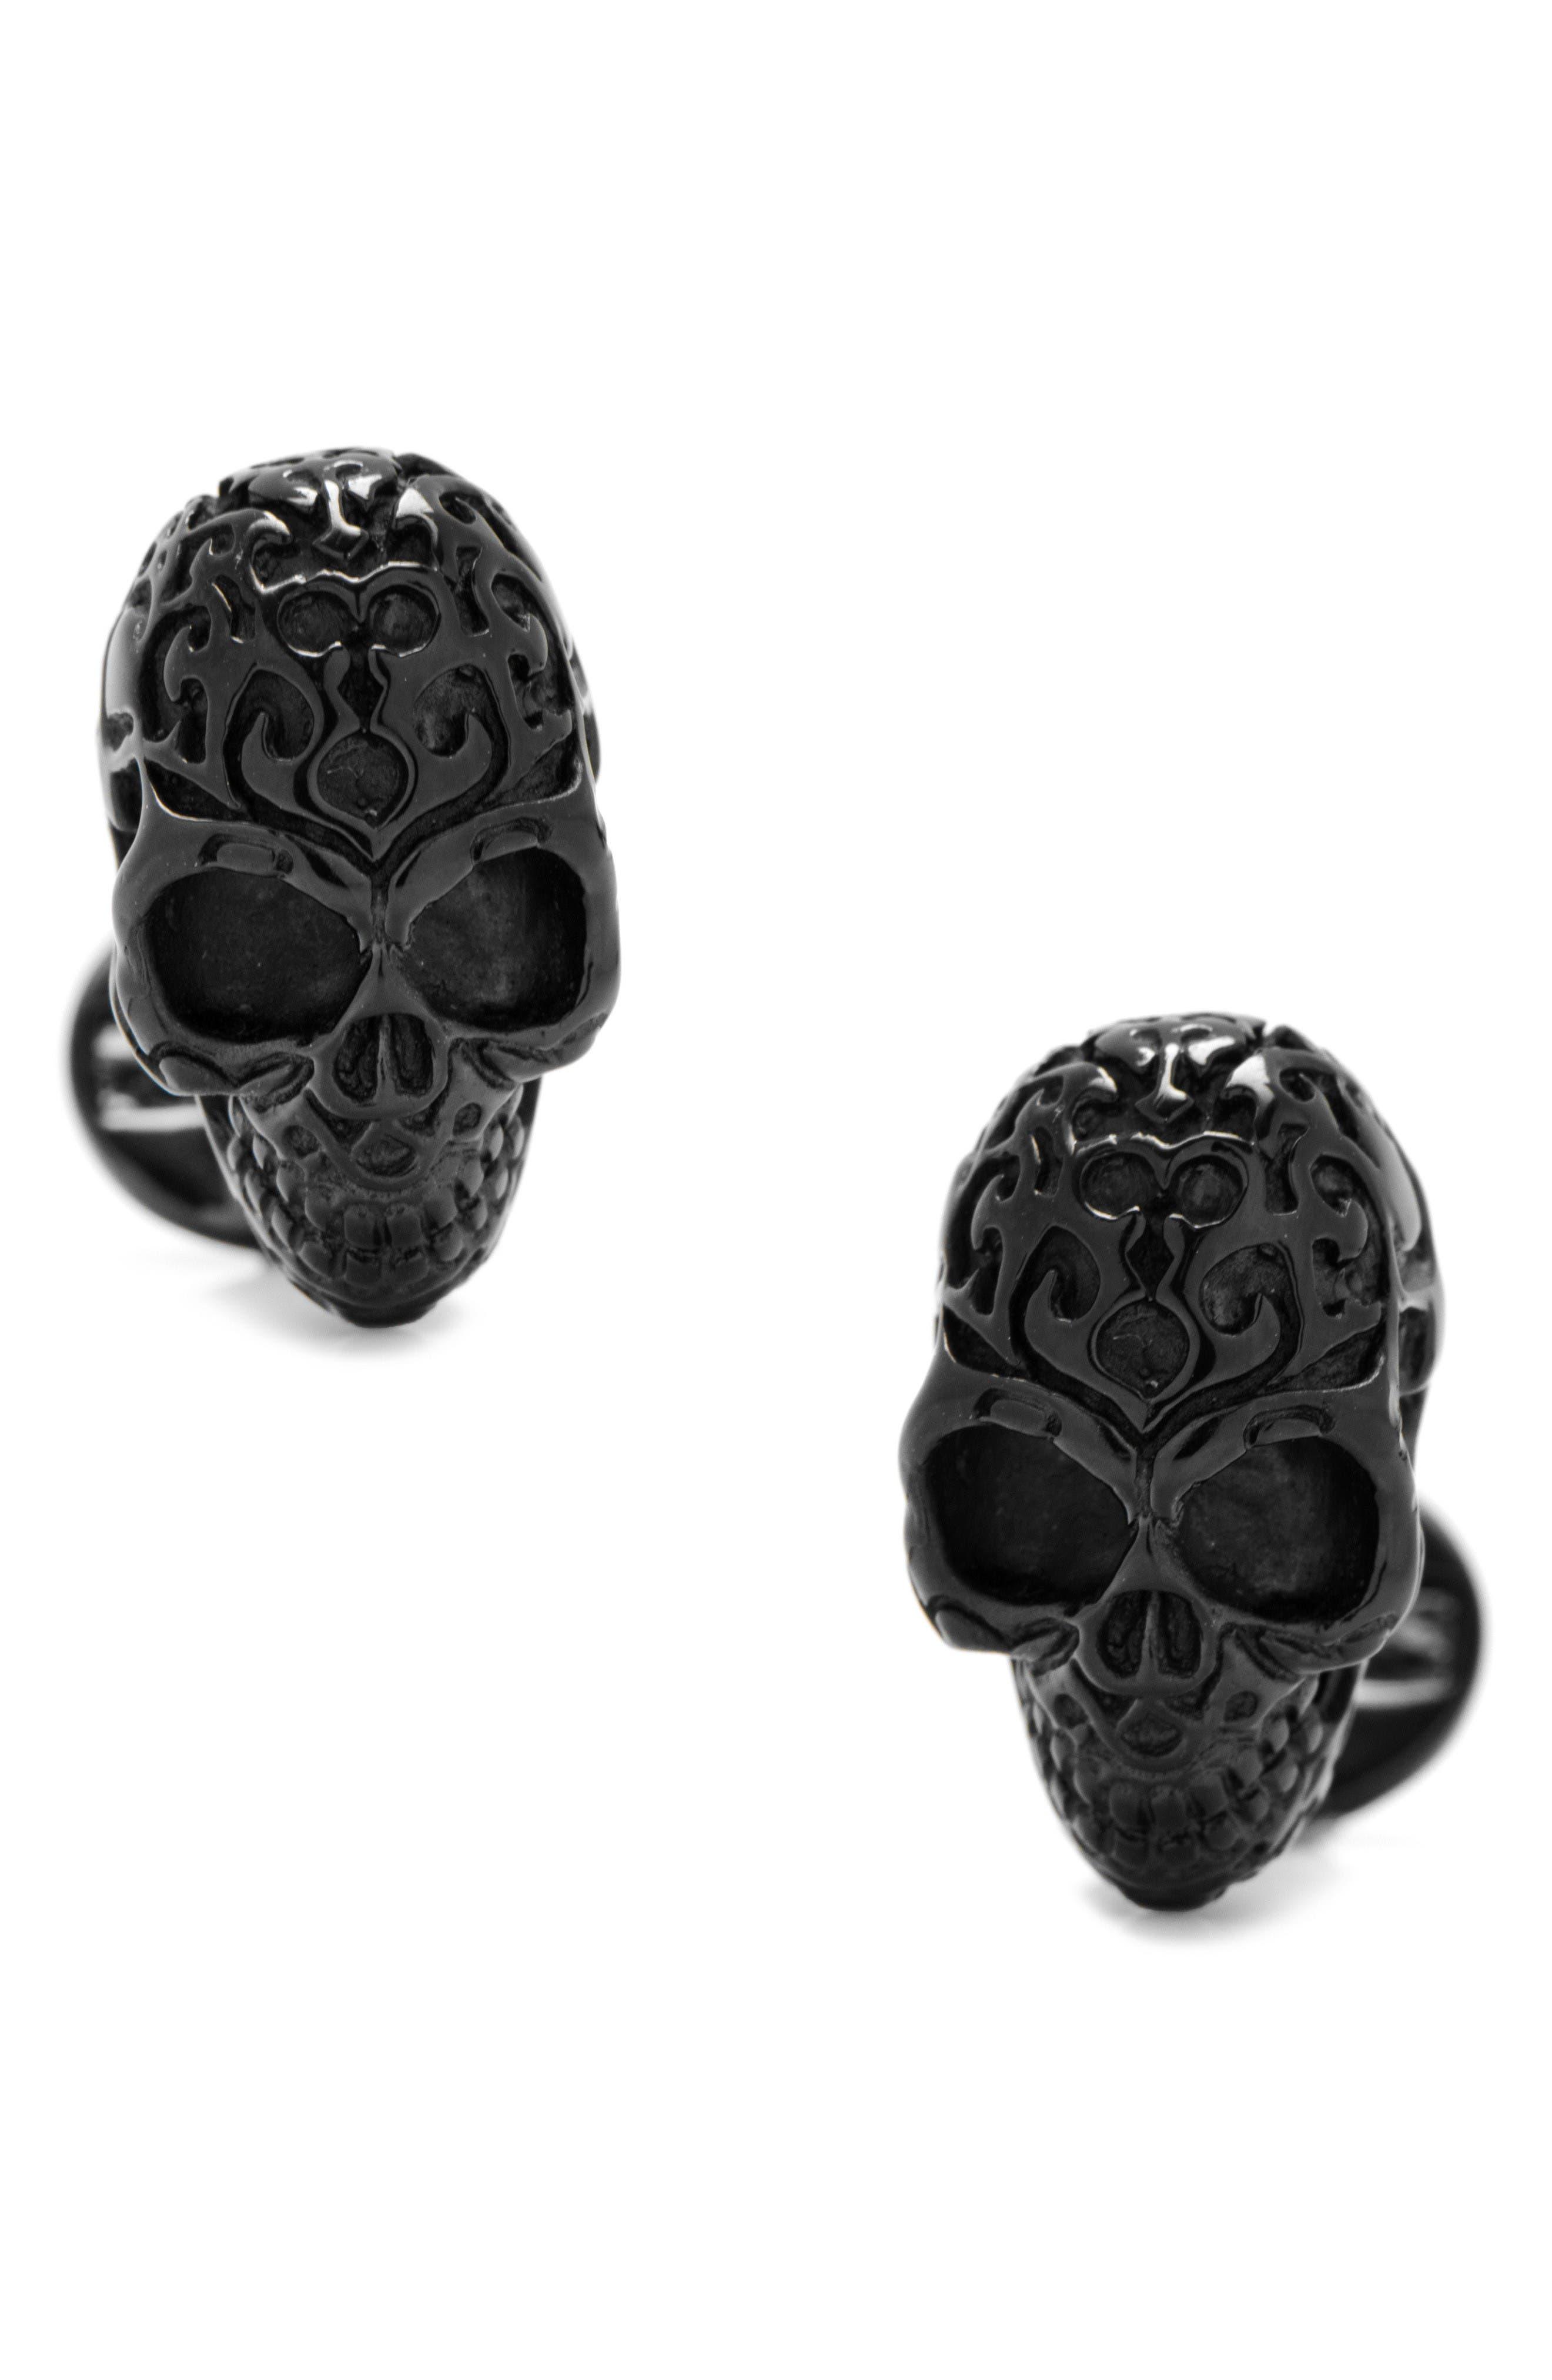 Alternate Image 1 Selected - Cufflinks, Inc. Black Fatale Skull Cuff Links